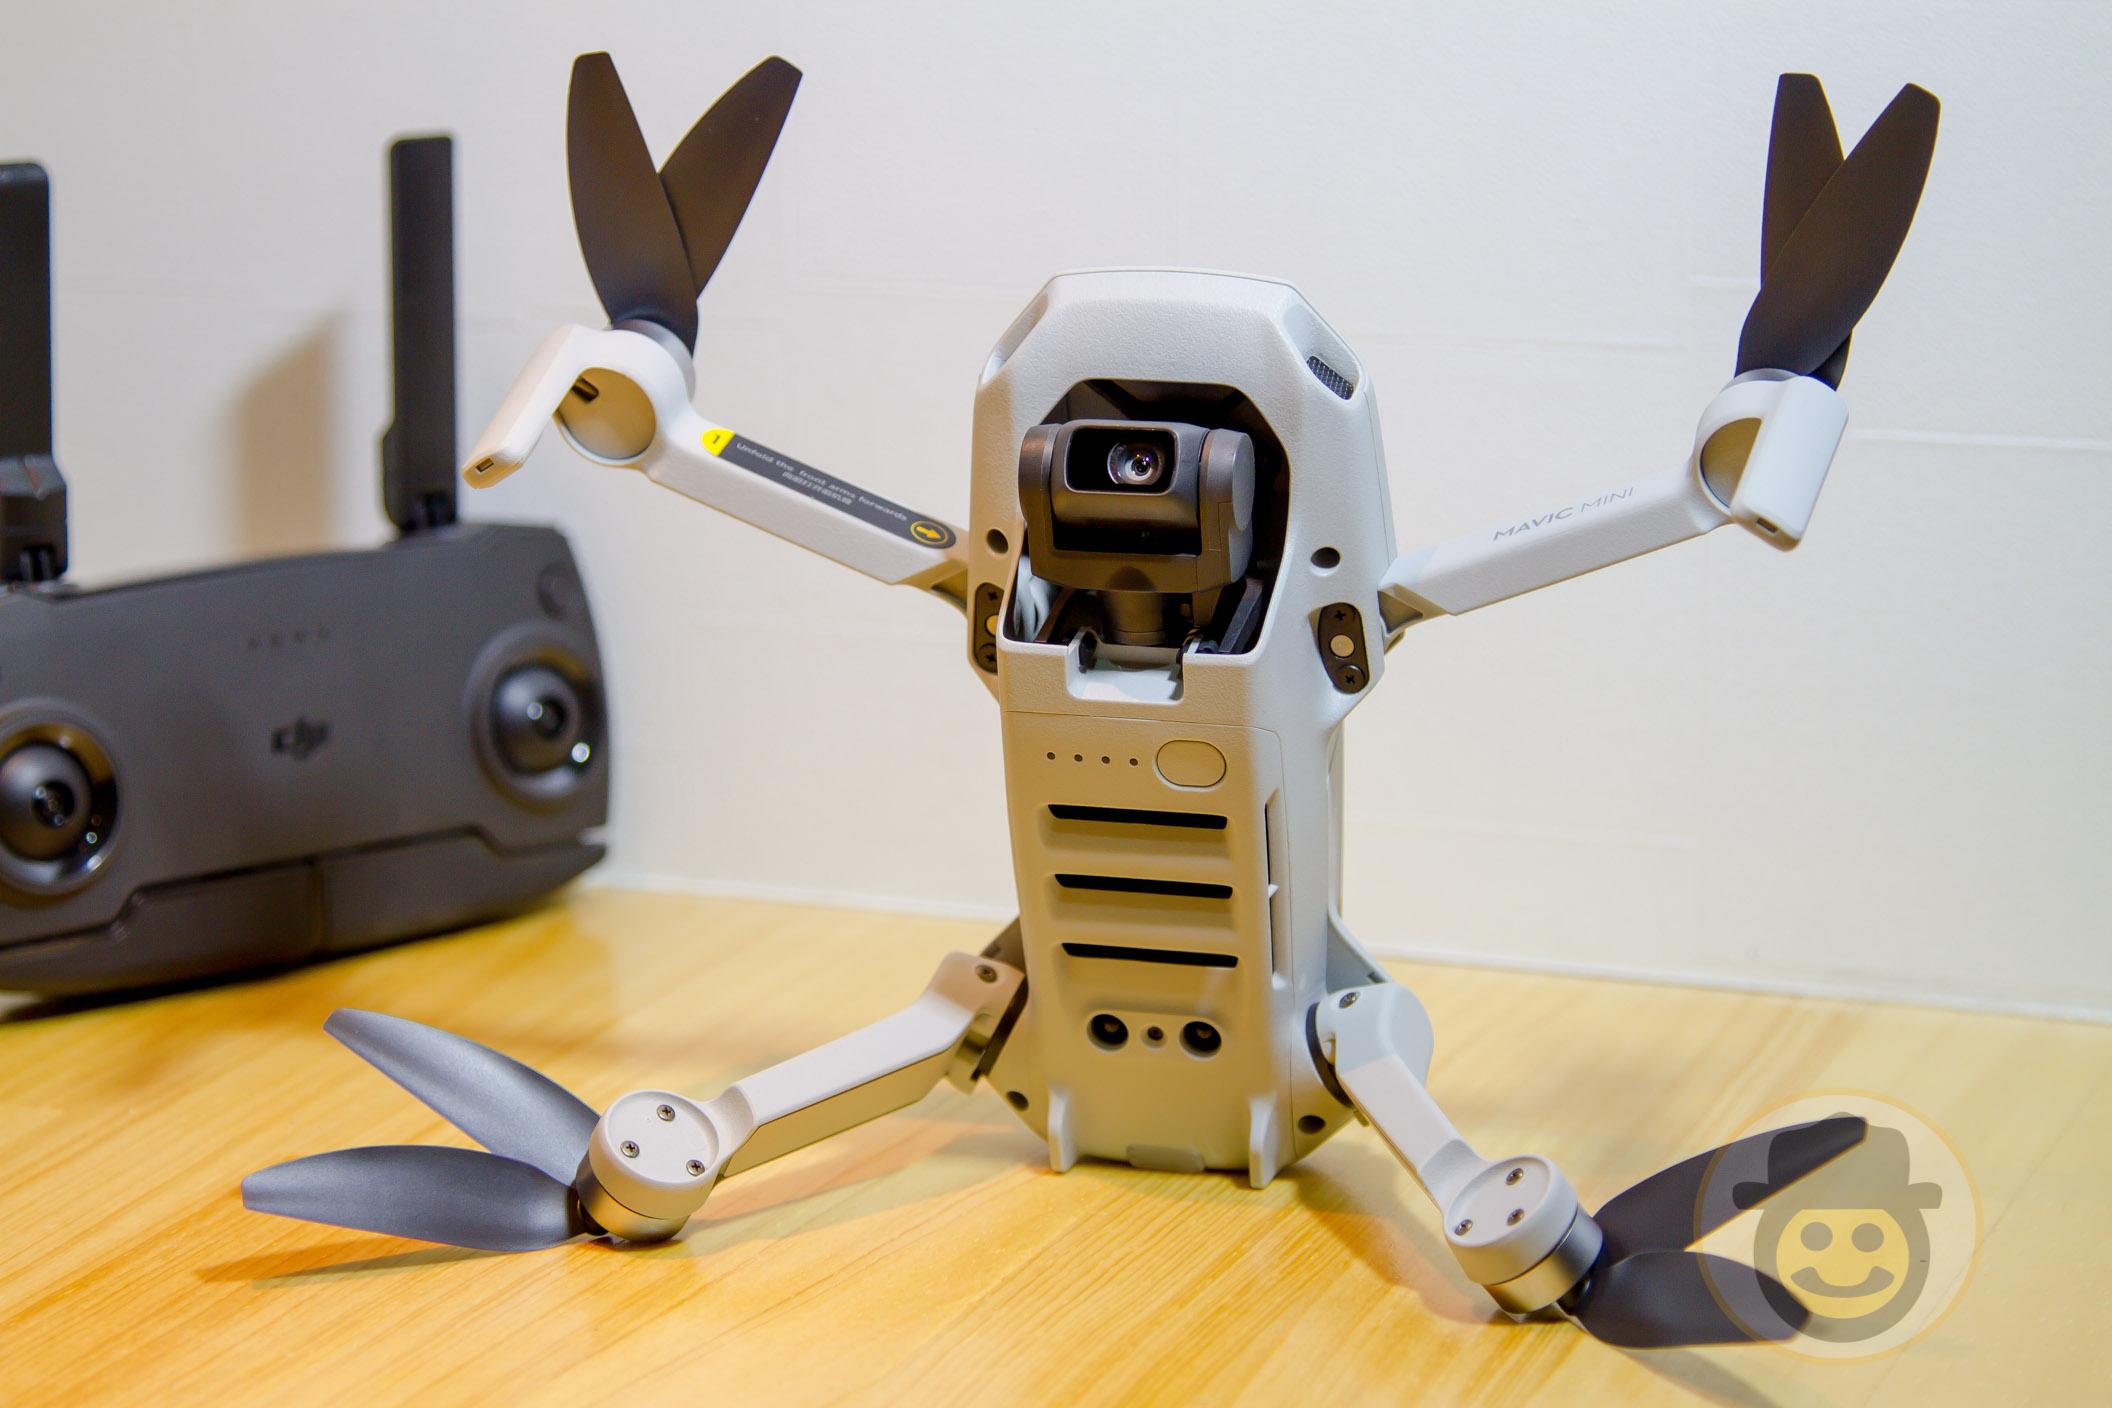 Dji [Mavic Mini Fry More Comboレビュー] 199gの高性能コンパクトドローンで手軽に空撮